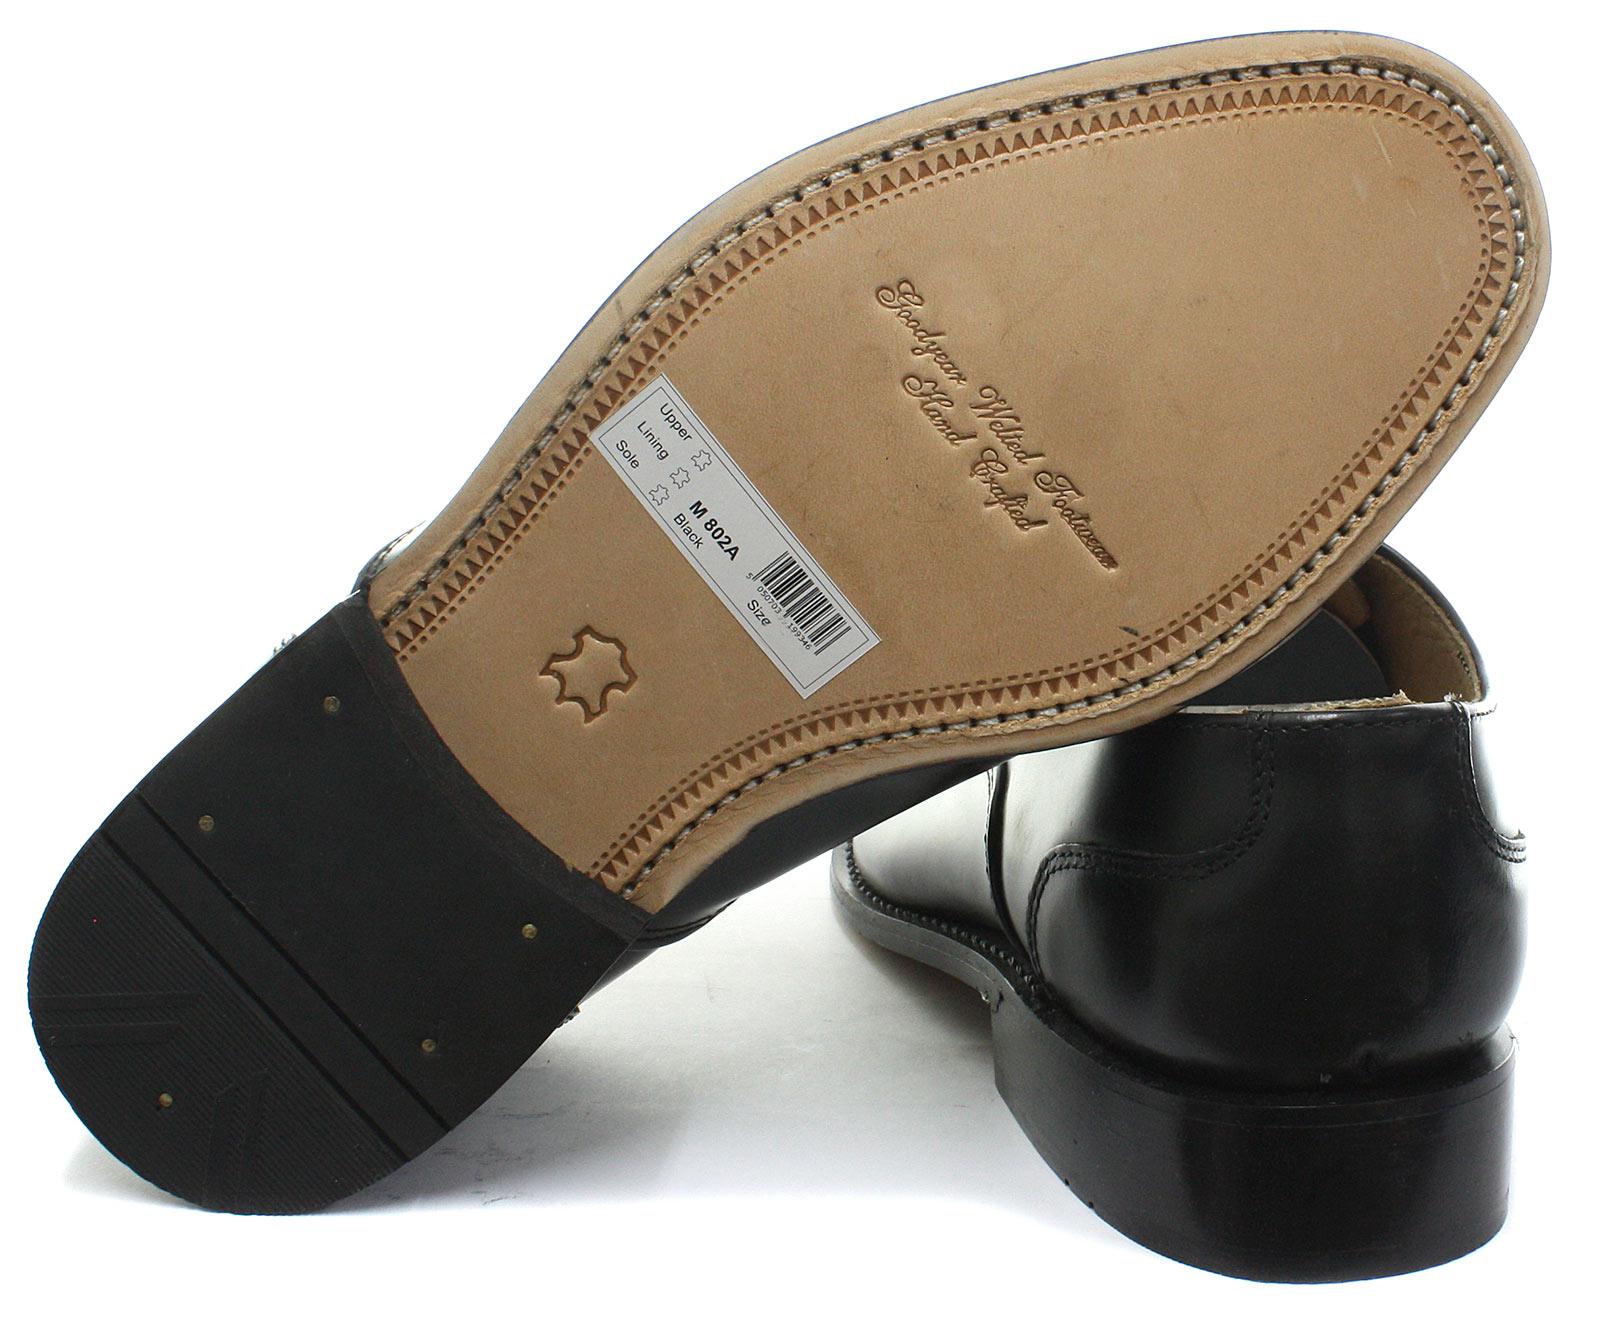 Up Capped Shoes Lace Black All Kensington Oxford Mens Classics Sizes x6nSZBwYq